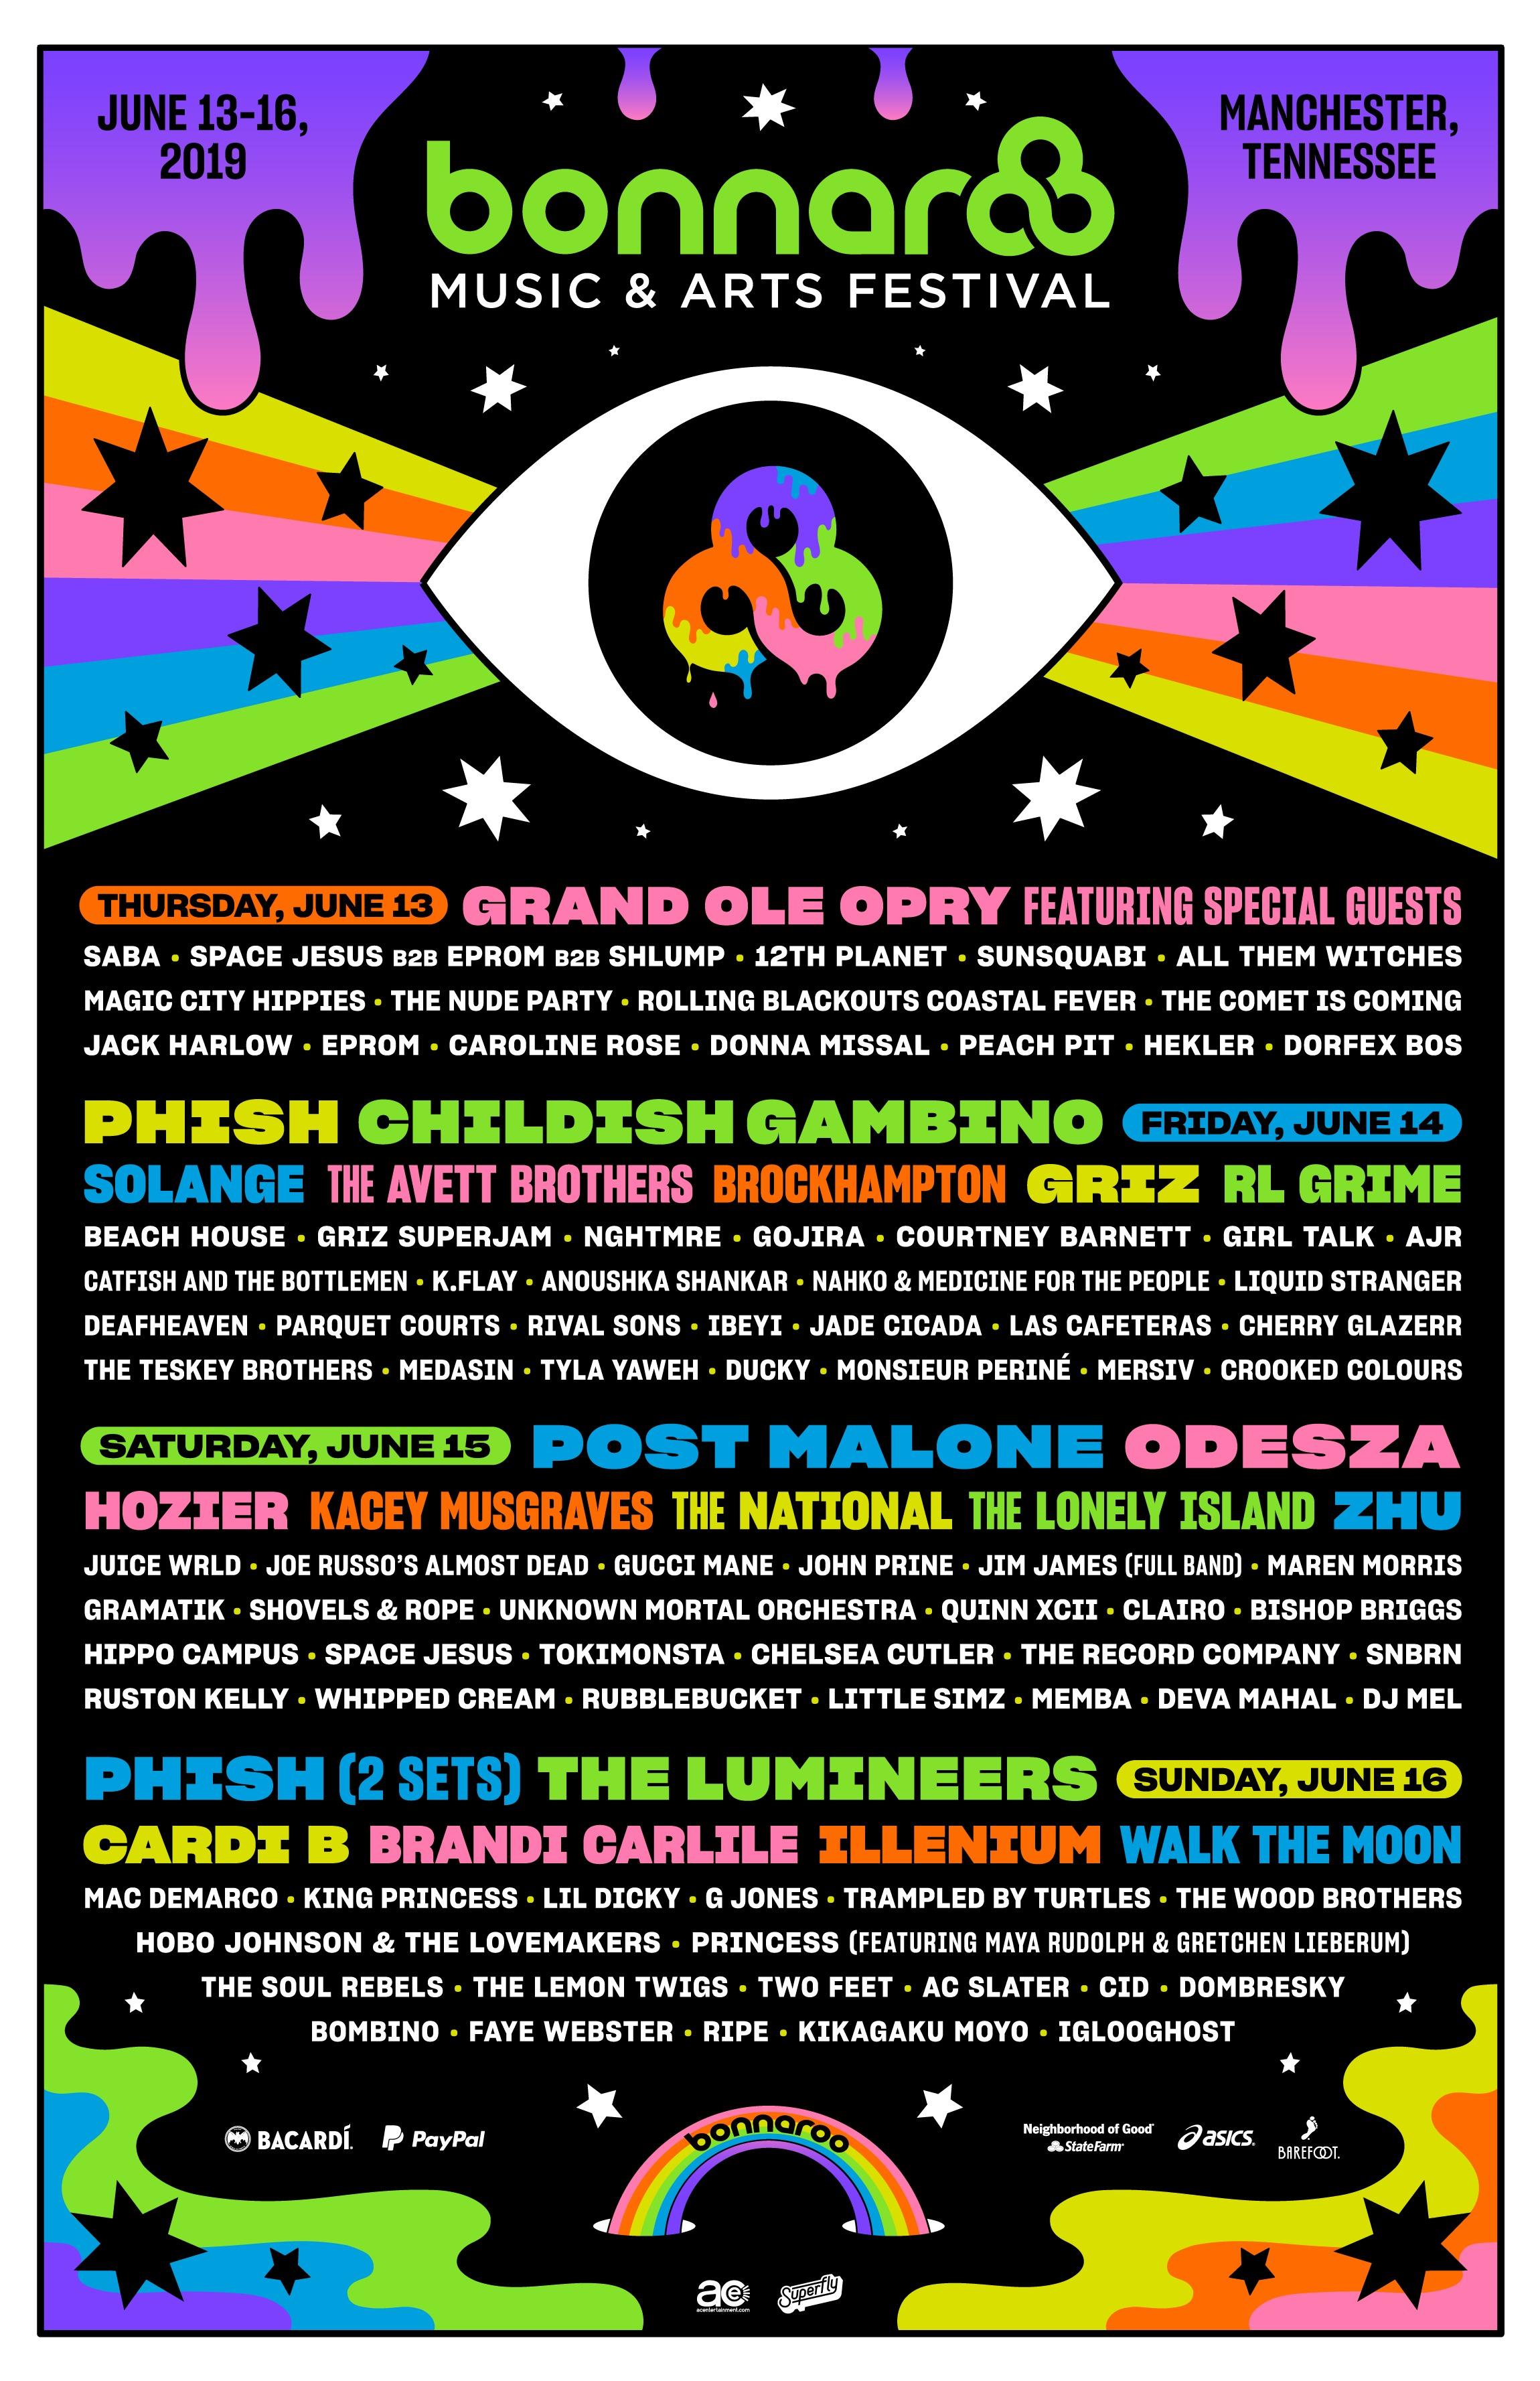 Bonnaroo 2019 lineup